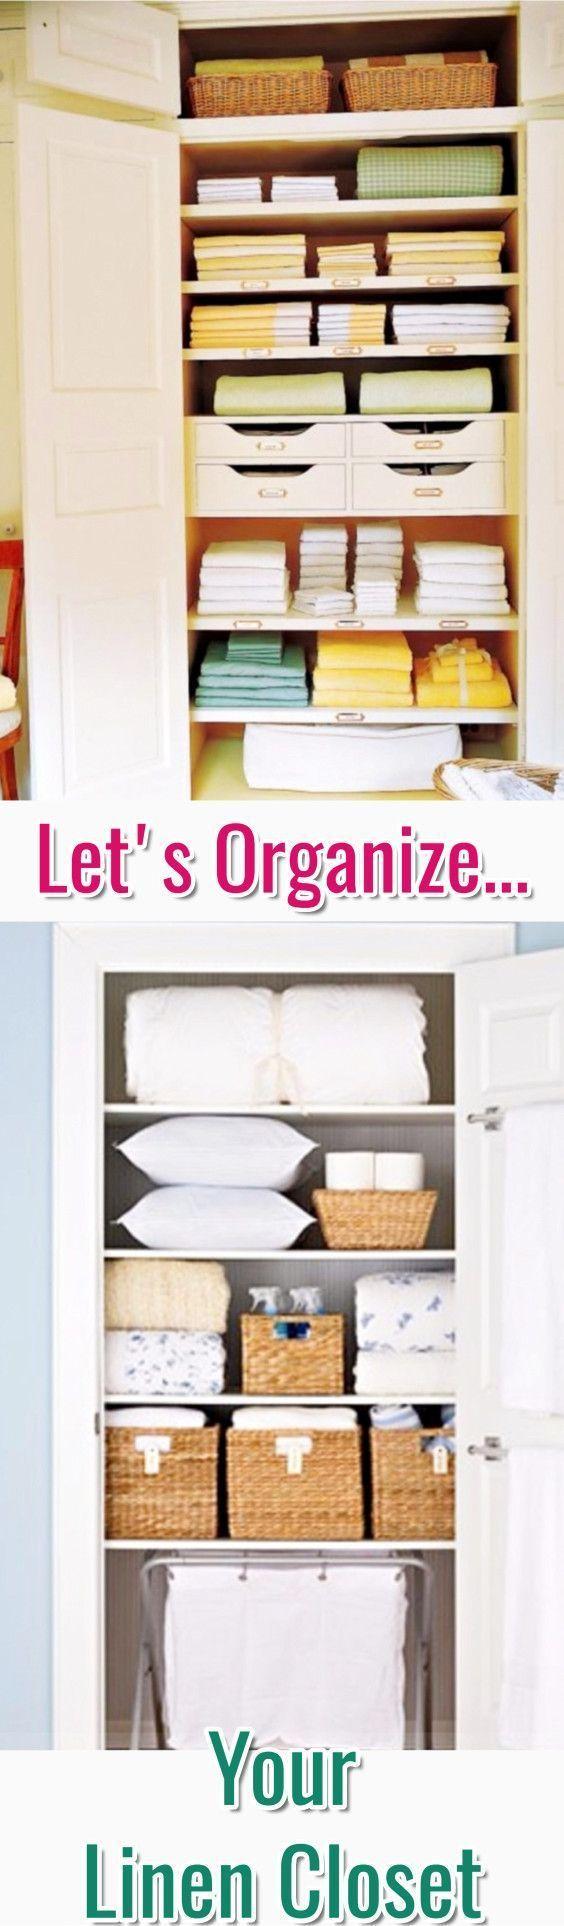 Linen closet organization ideas - Get Organized - 50 Simple & Smart Organizing Ideas for Home #gettingorganized#organizationideasforthehome #lifehacks